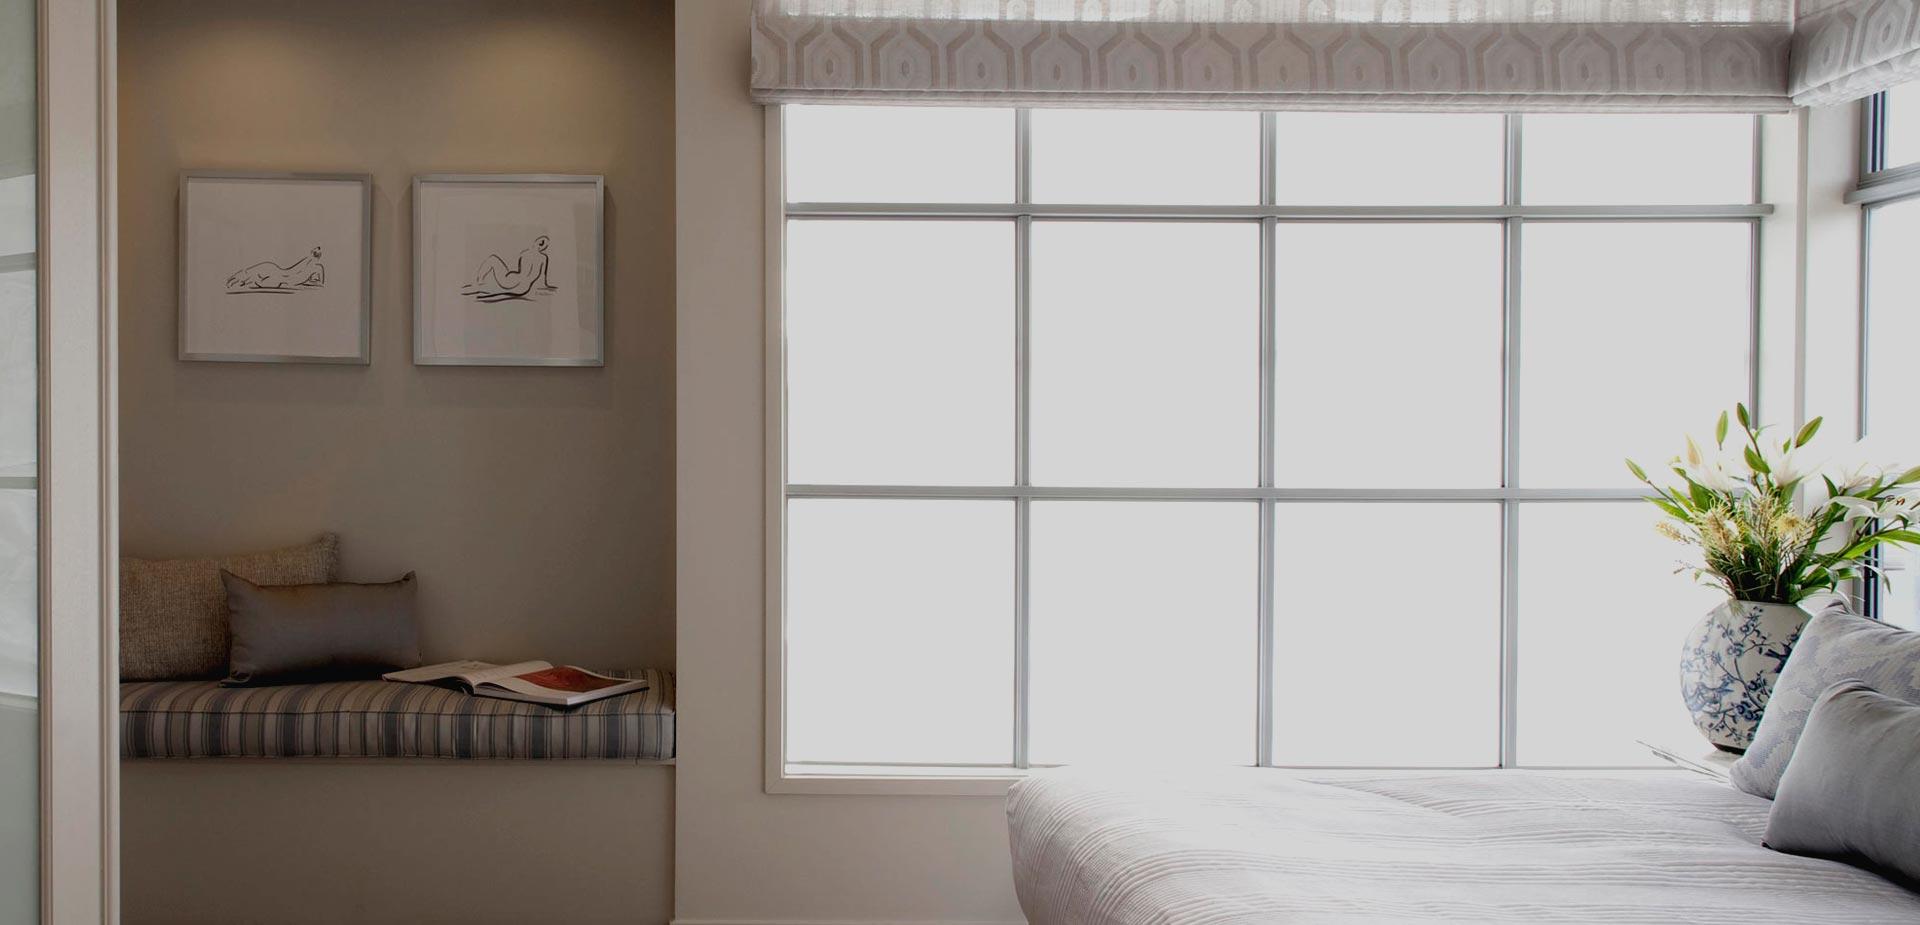 alcomex-indo-aluminium-laquer-furniture-extrusion-finished-goods-finished-goods-3